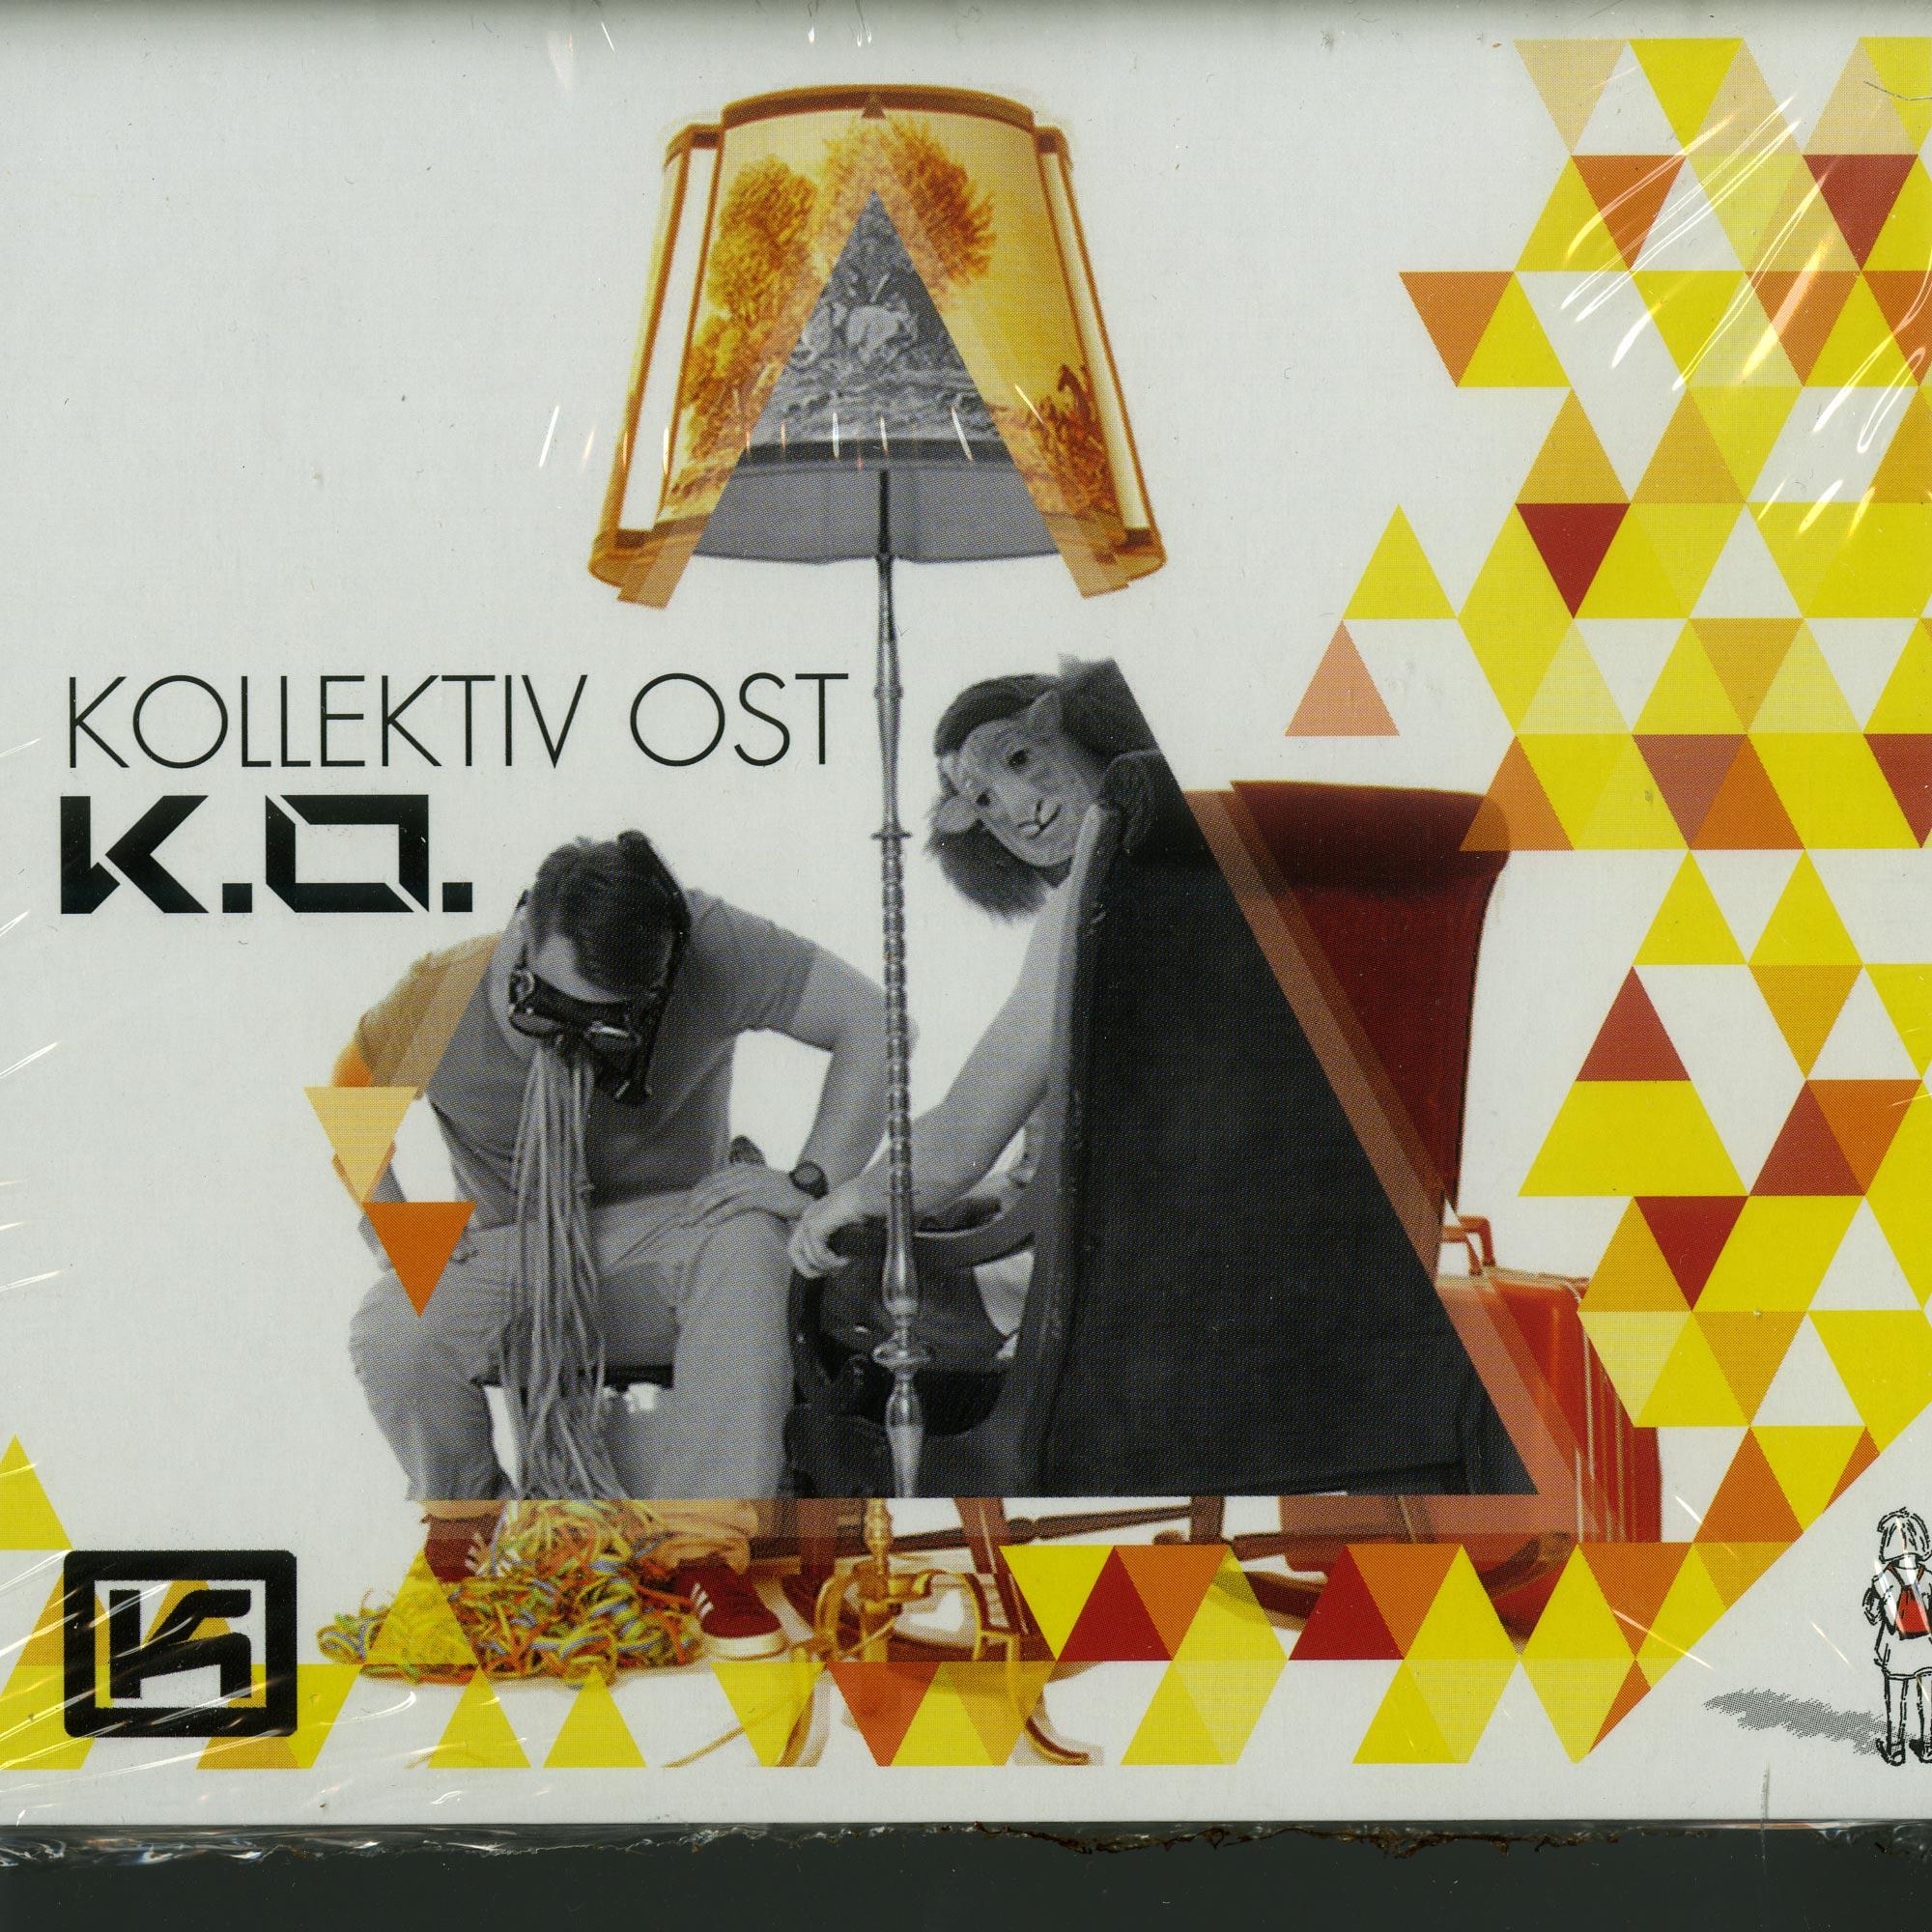 Kollektiv Ost - K.O.